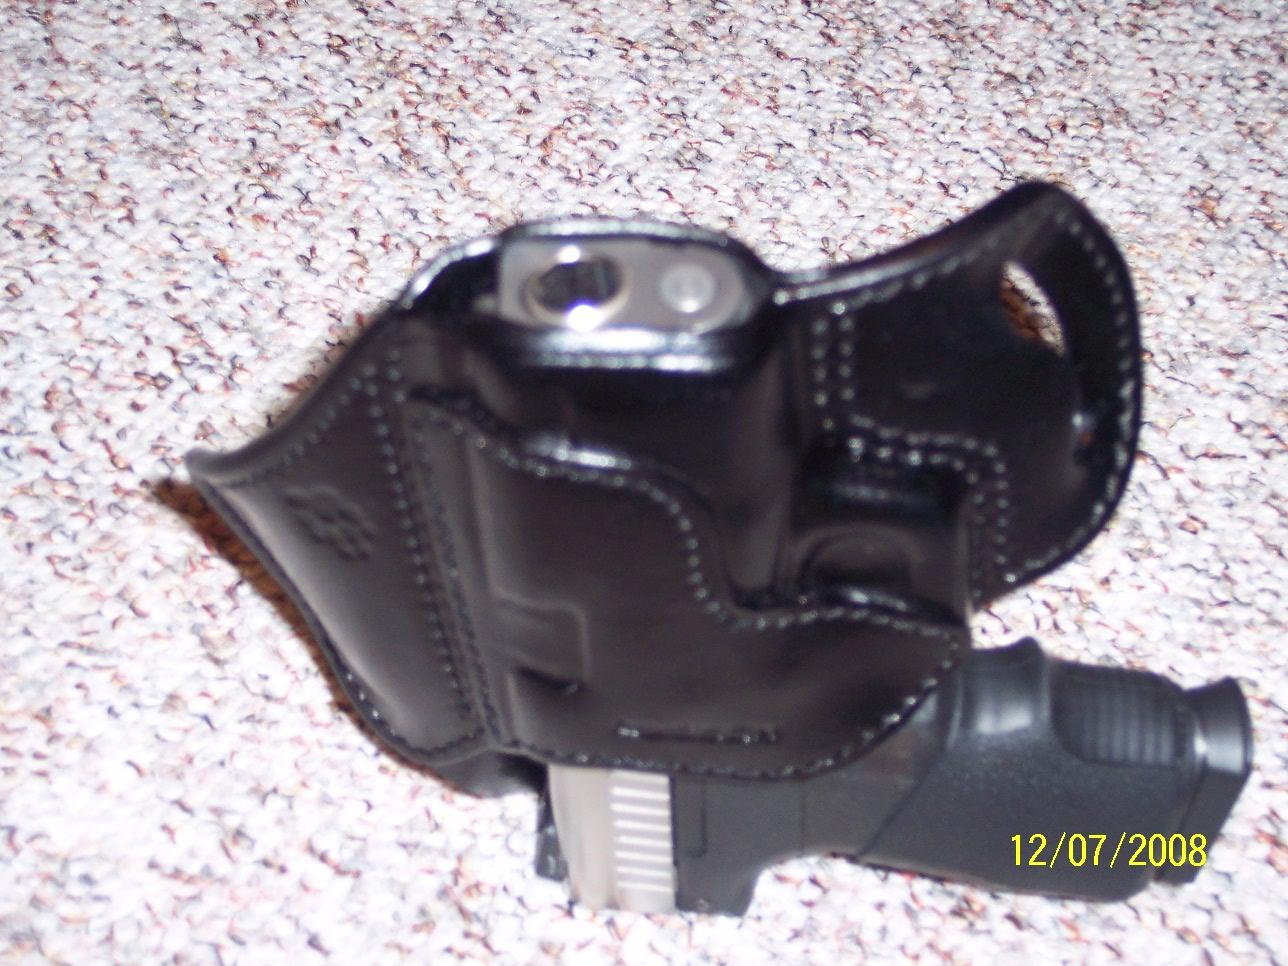 New NOSSAR leather for my PM45-new-nossar-holster-4.jpg